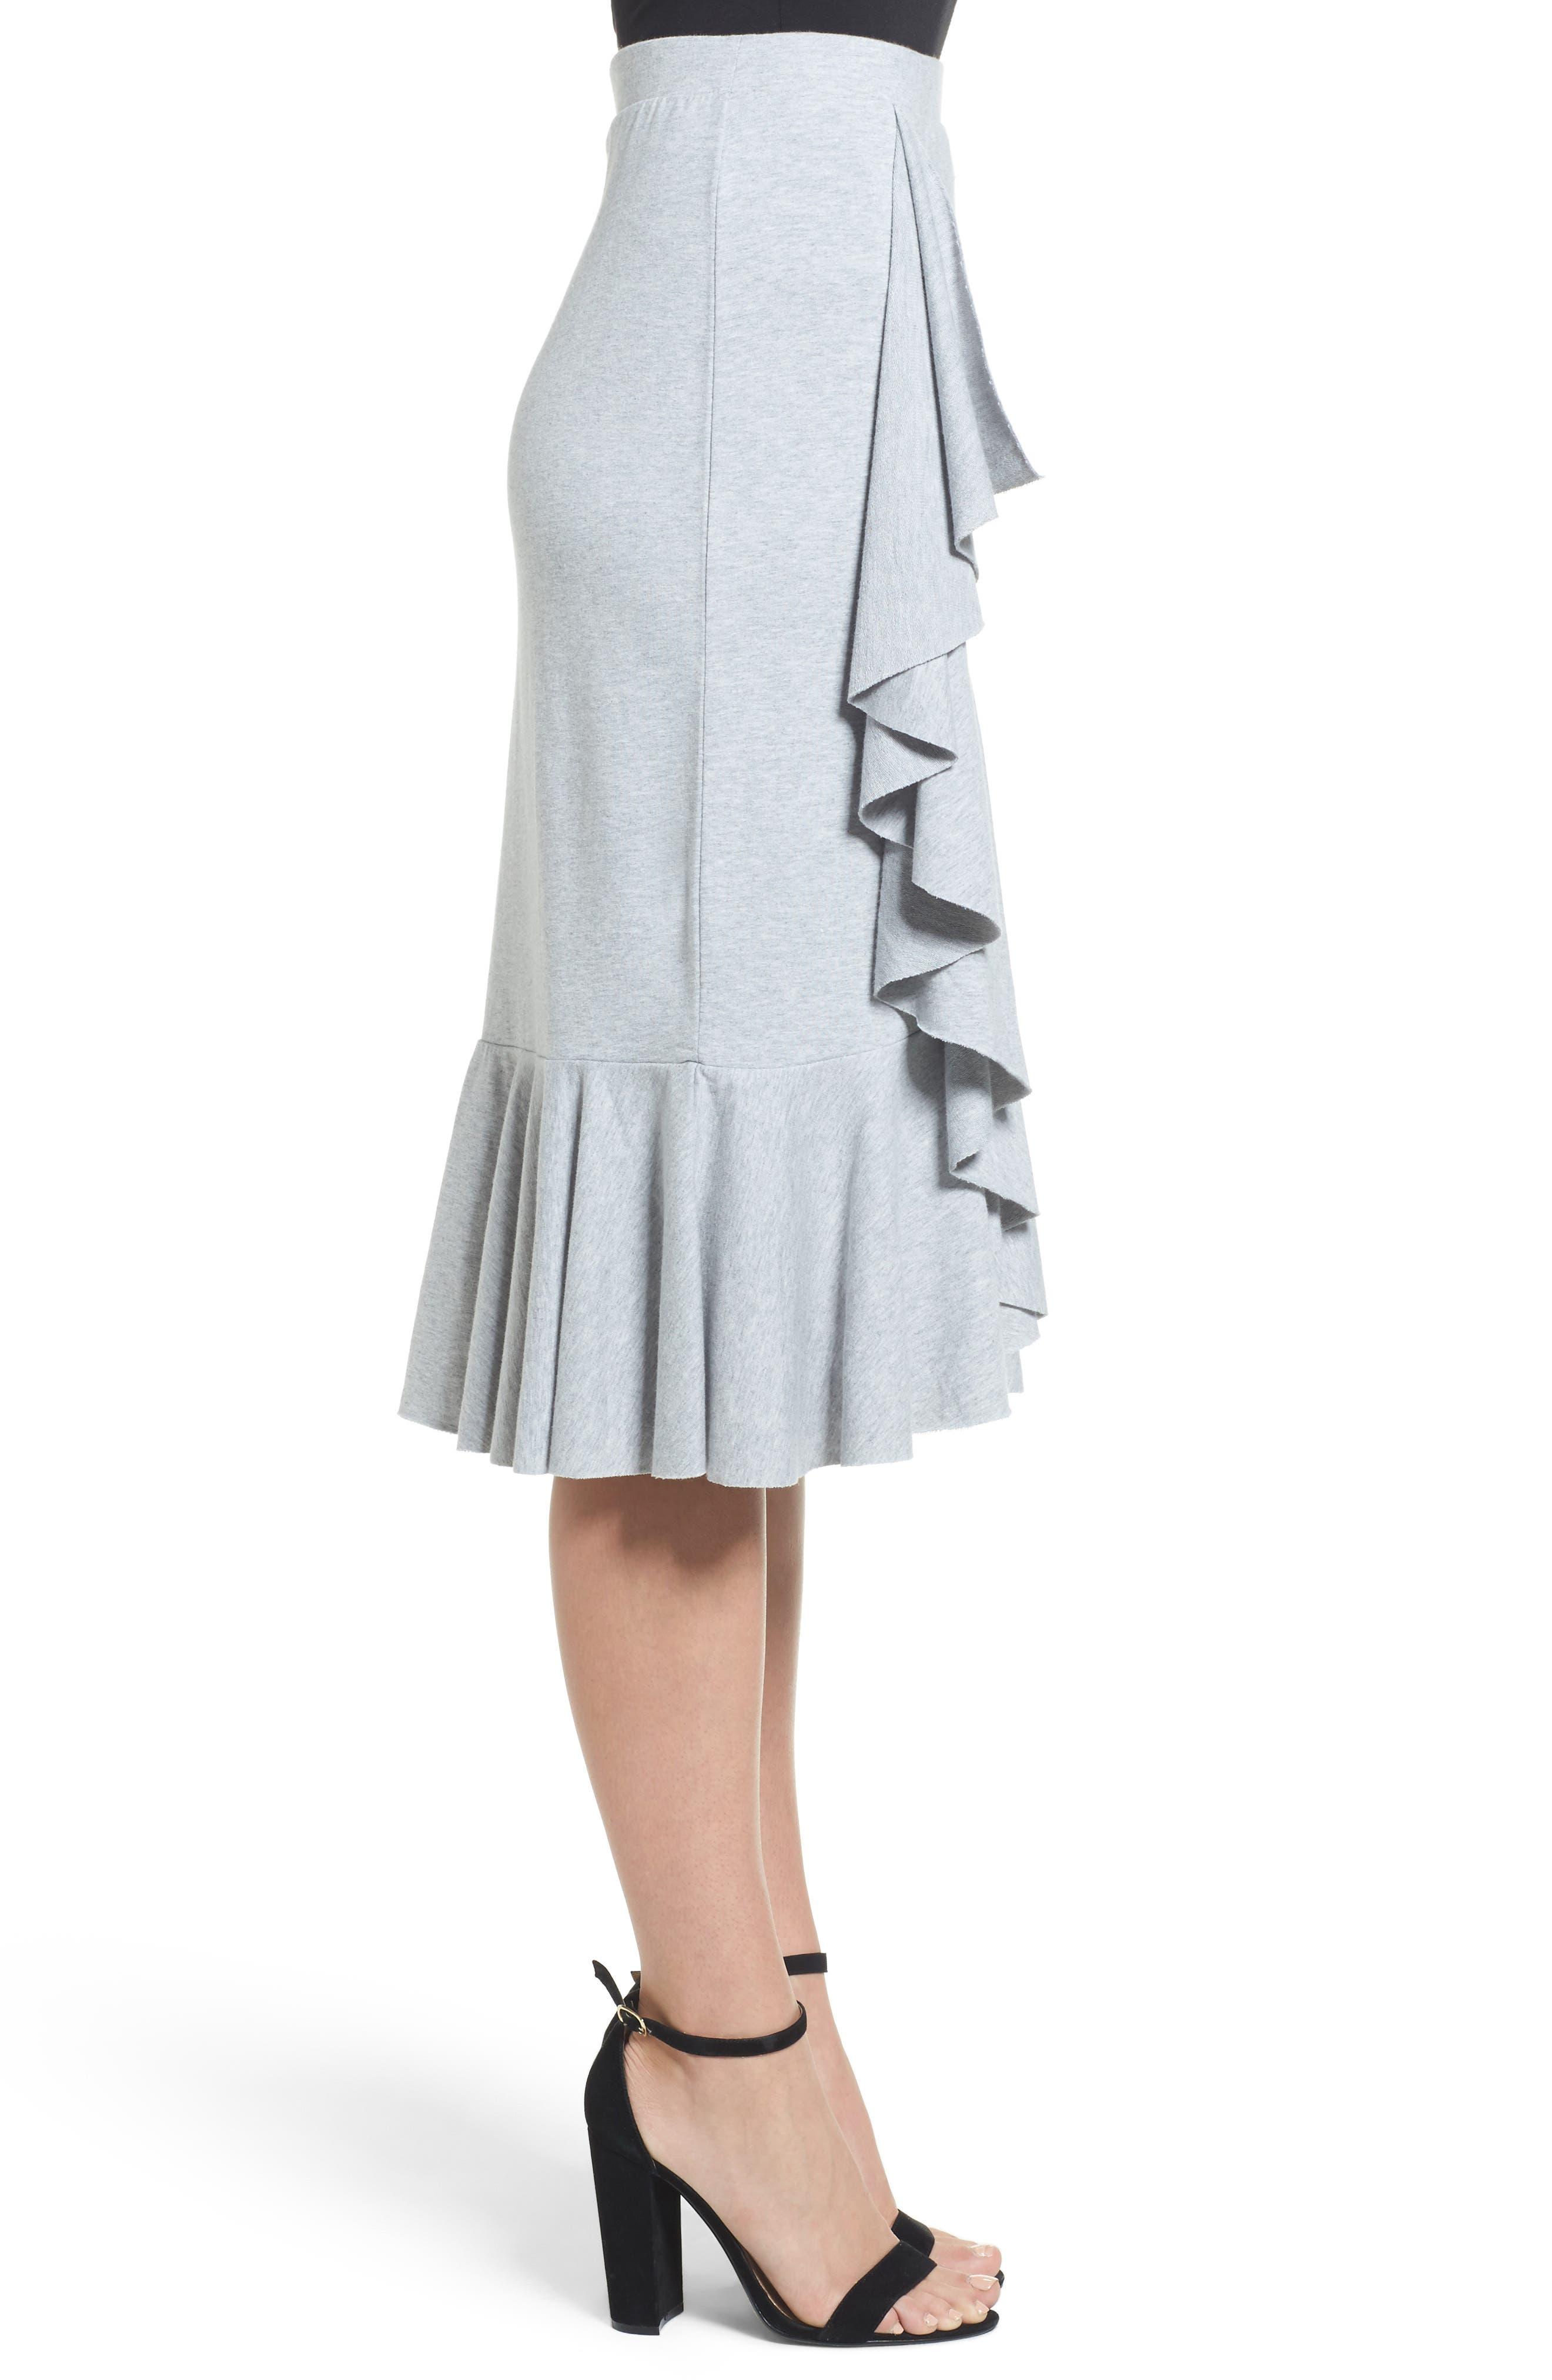 Ruffled Knit Skirt,                             Alternate thumbnail 3, color,                             Heather Grey